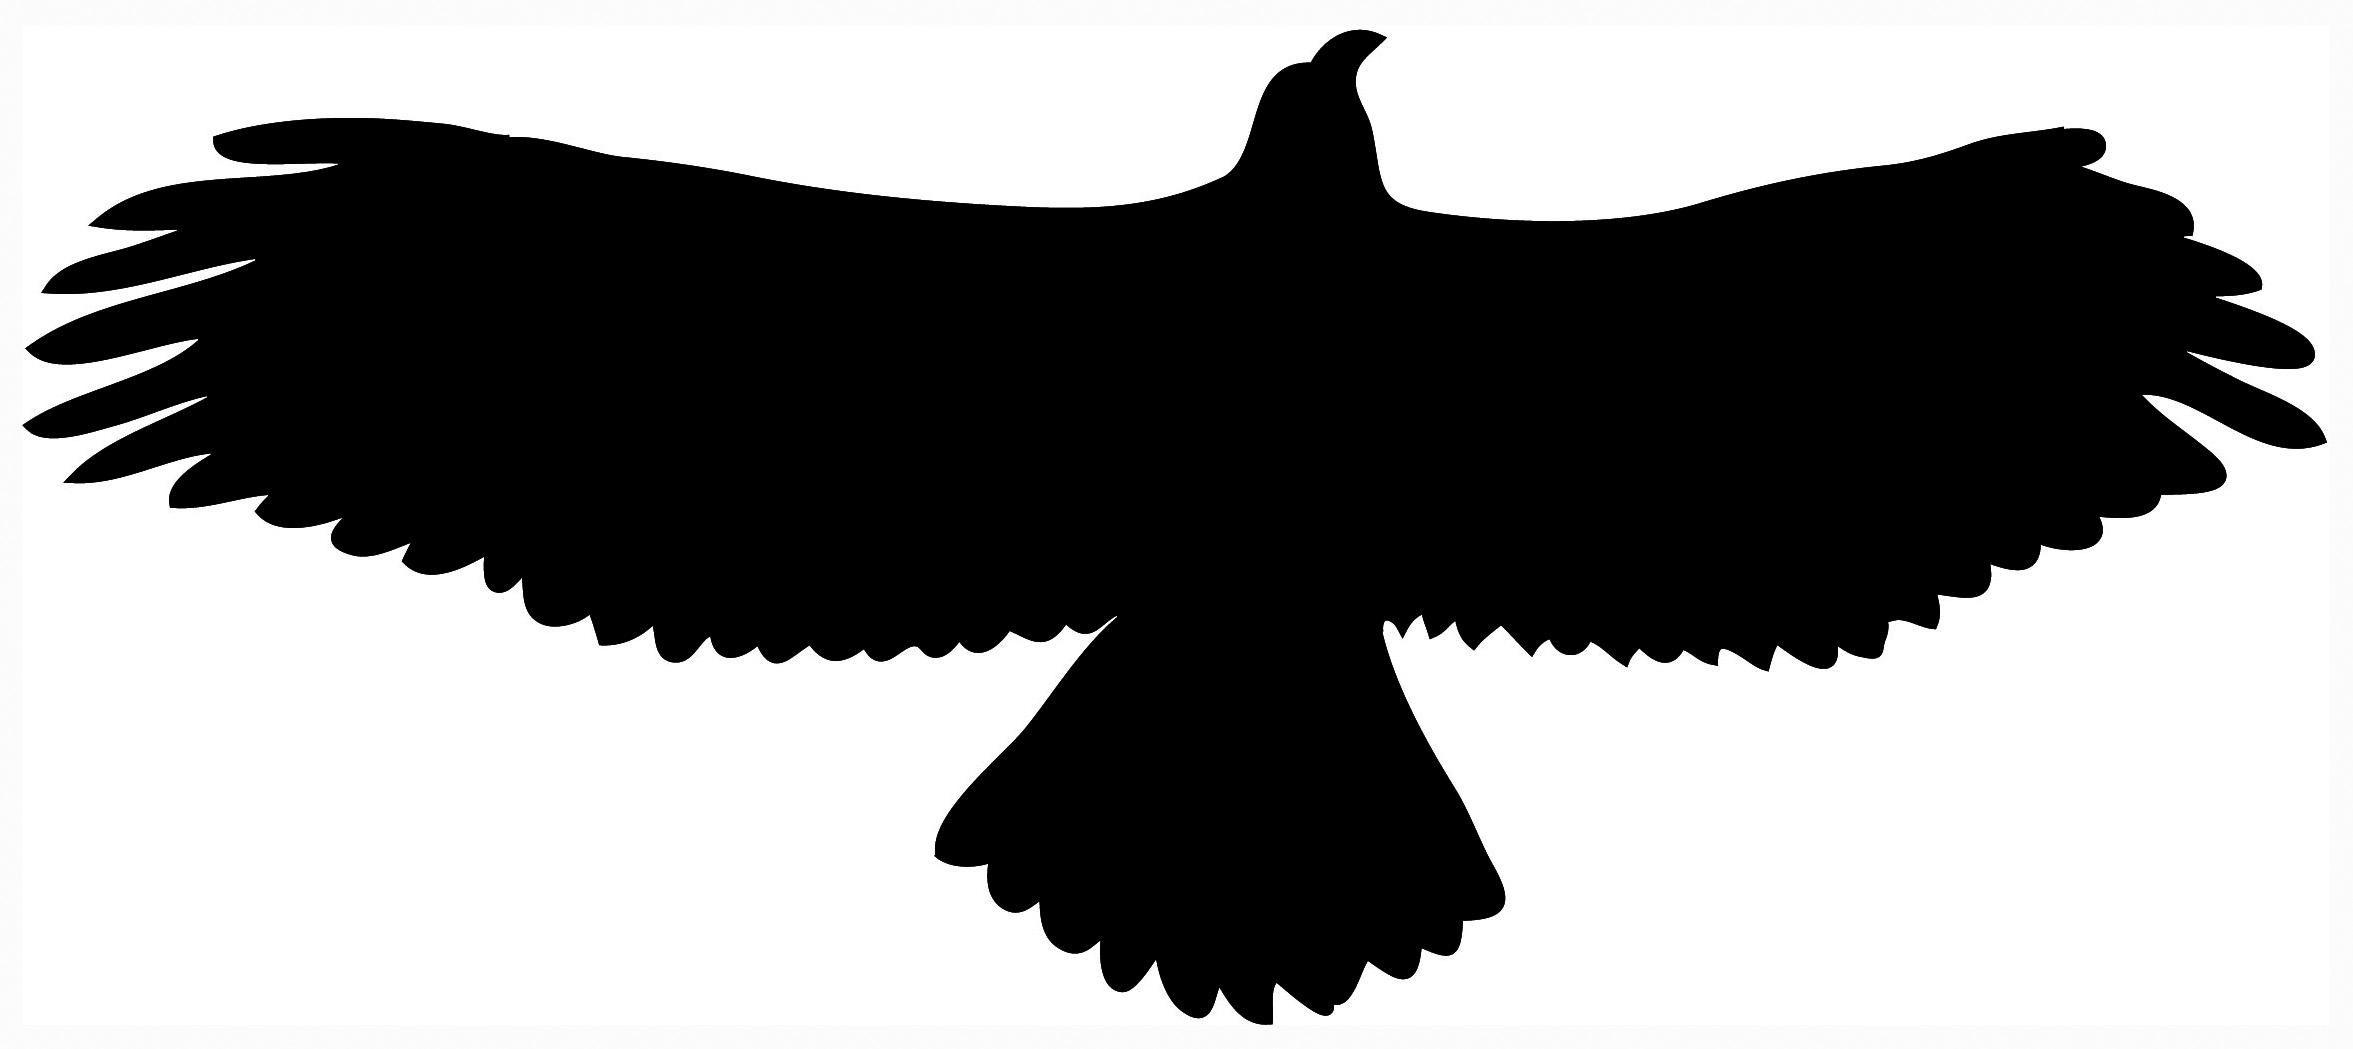 2353x1049 Clip Art Owl Silhouette Clip Art